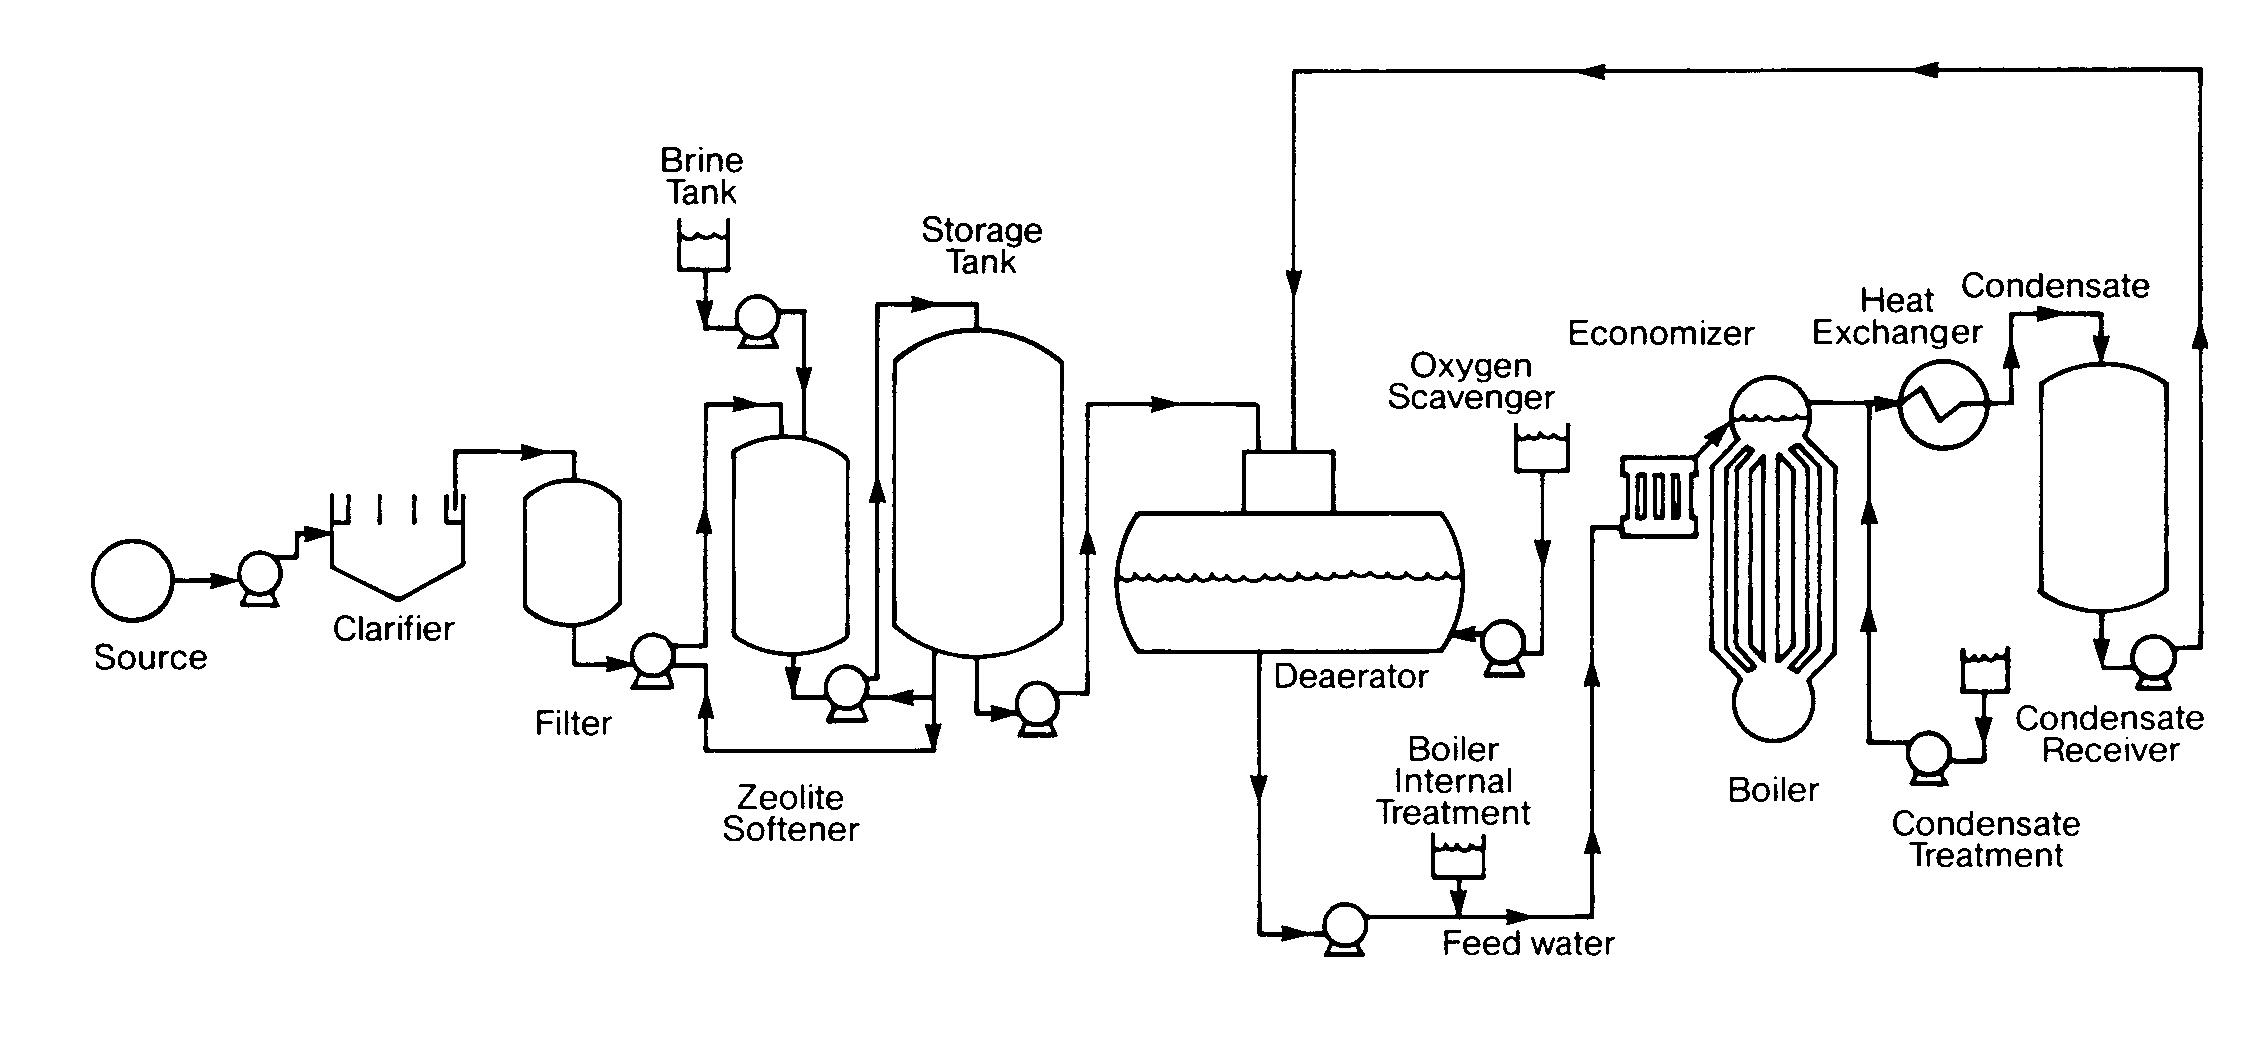 Dunkirk Boiler Wiring Diagram